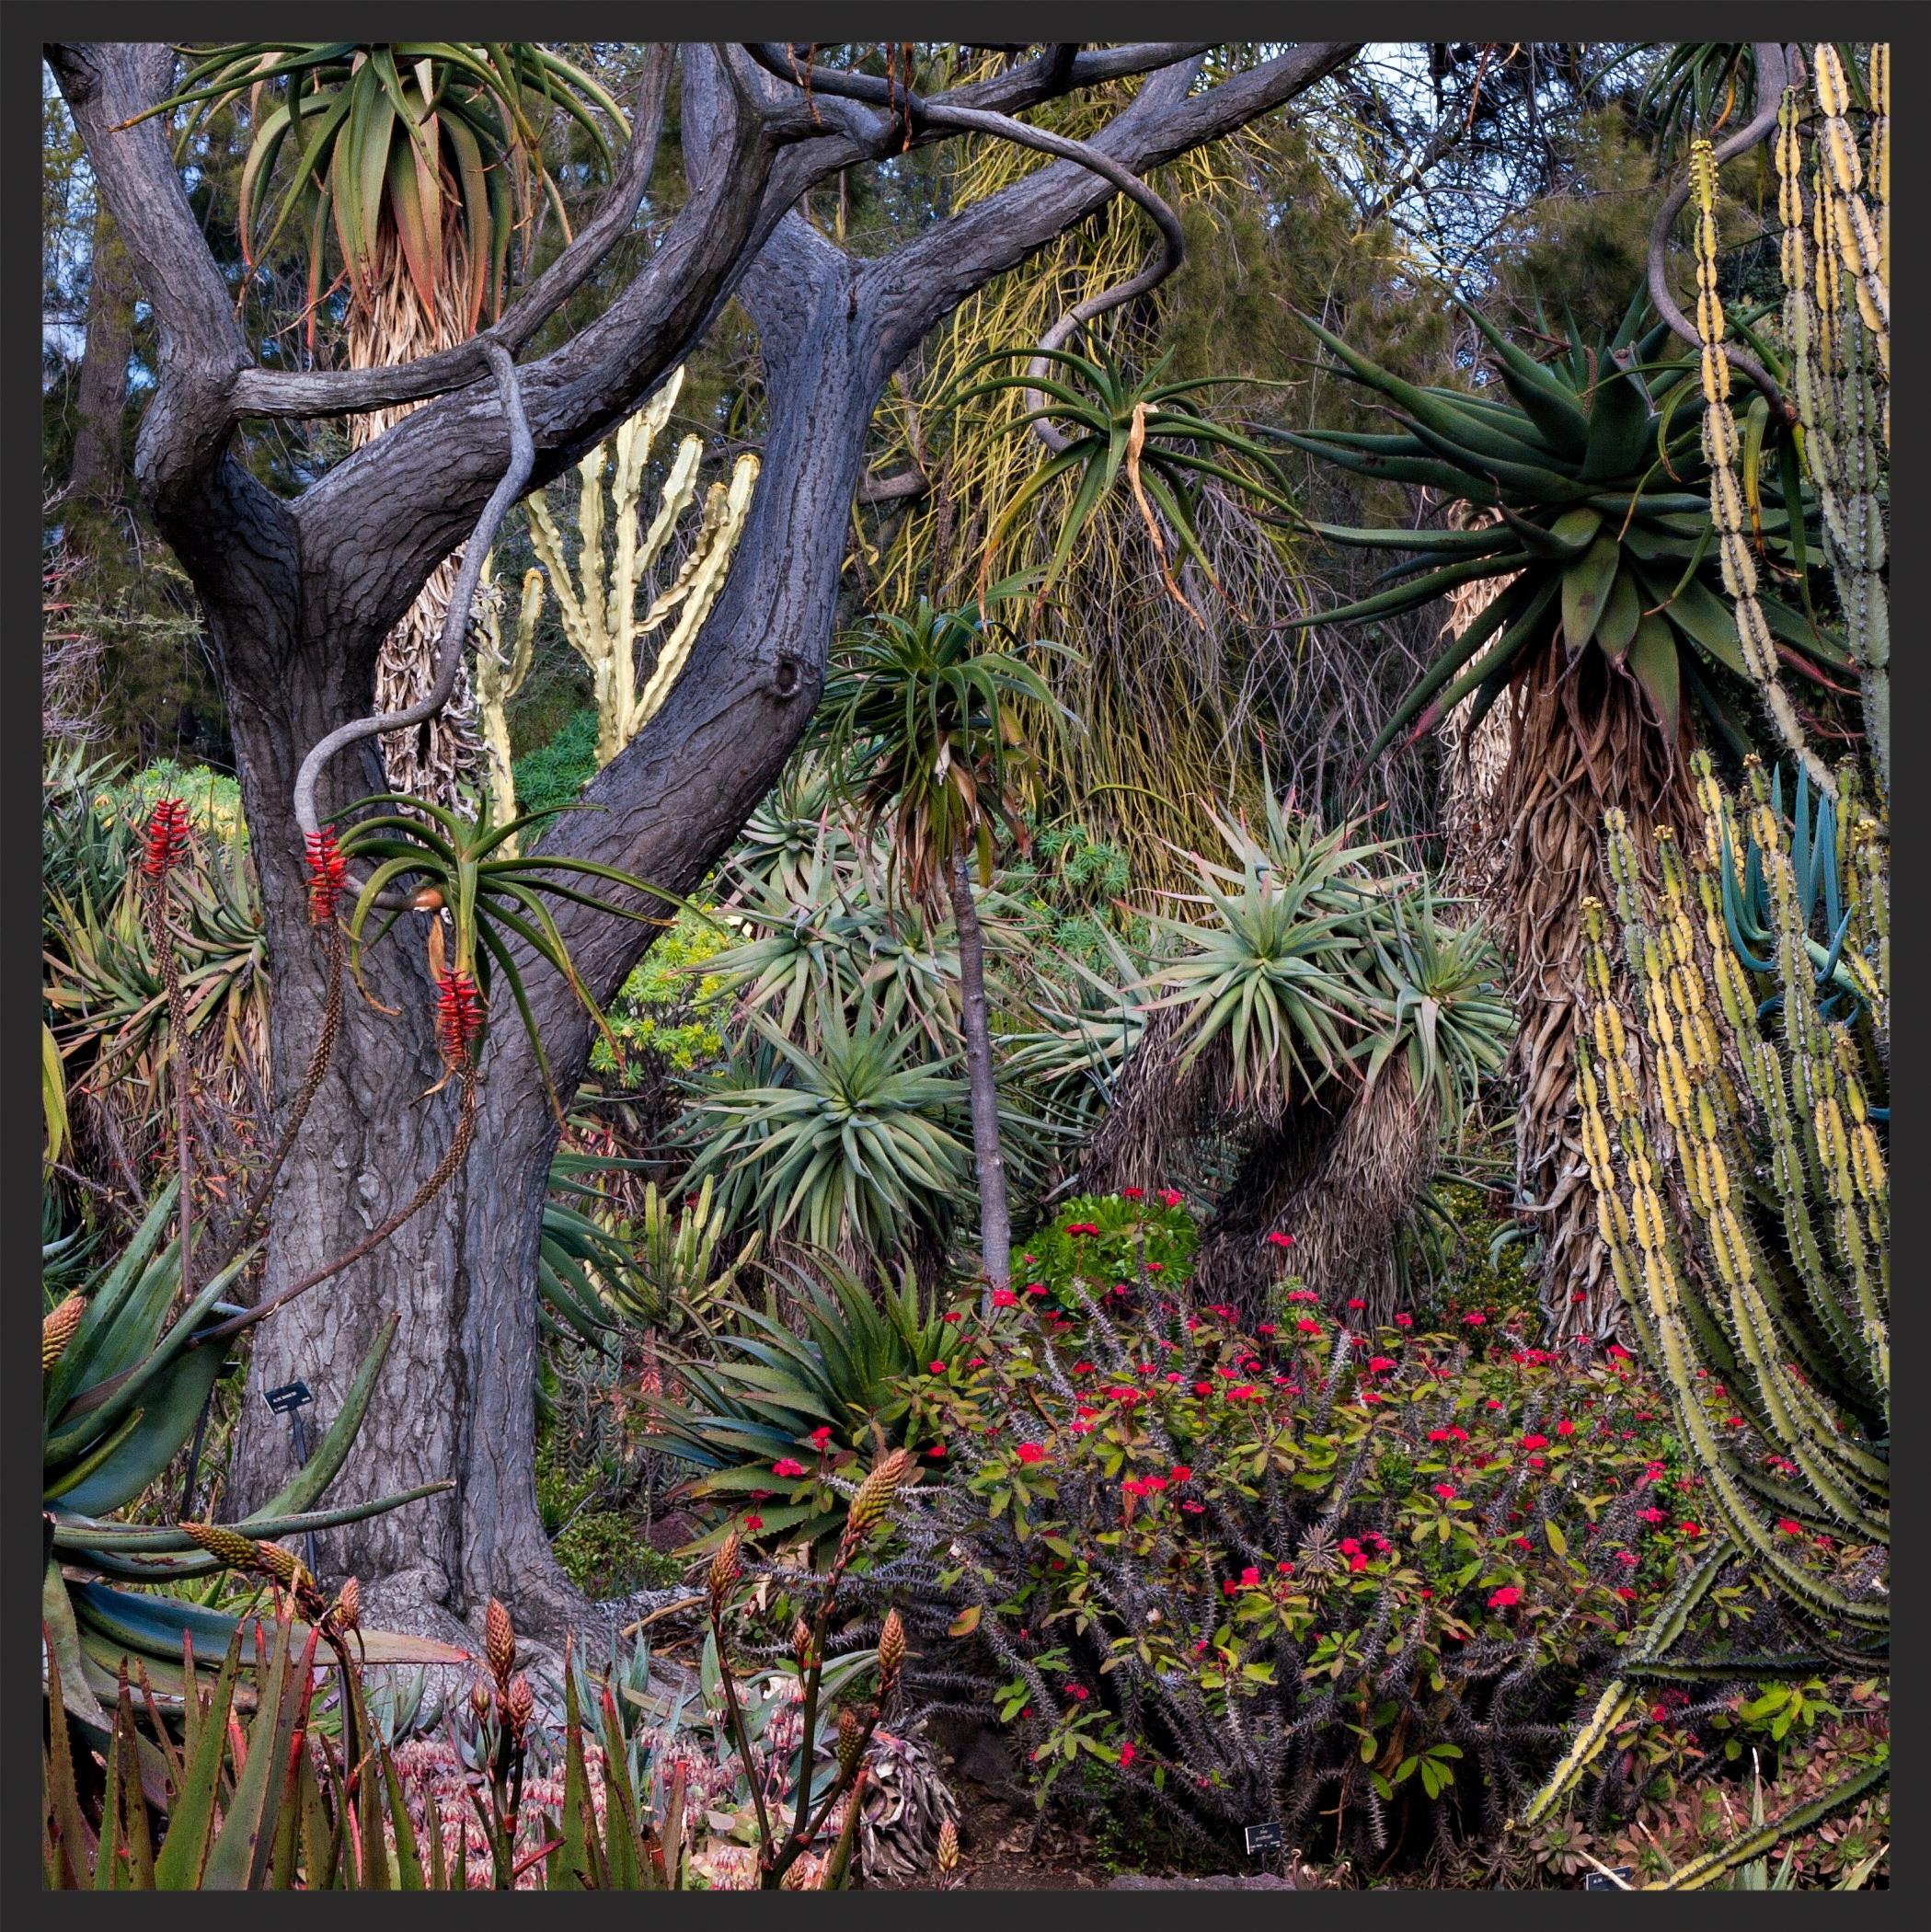 Mosquin-20060318-11006-huntington-gardens-1500sq.jpg